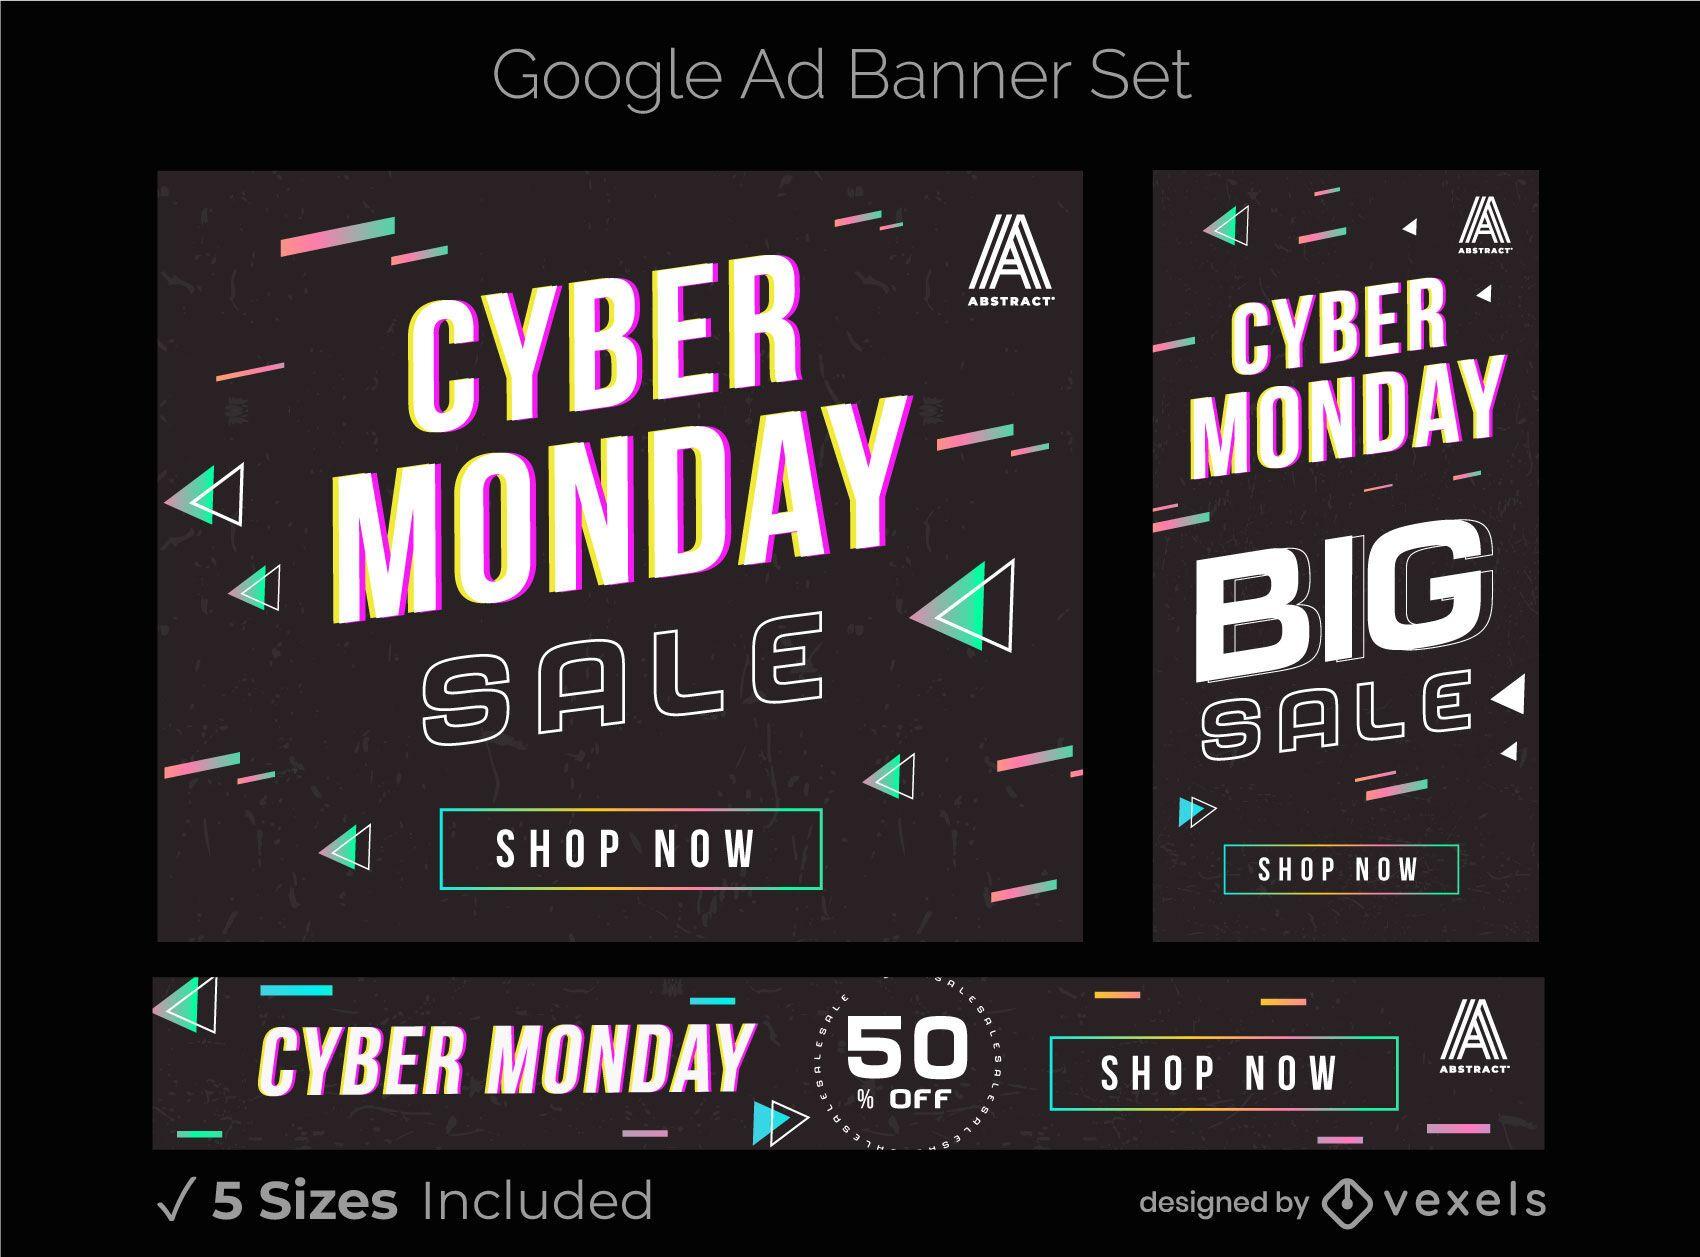 Conjunto de banner de anuncios de google de cyber monday